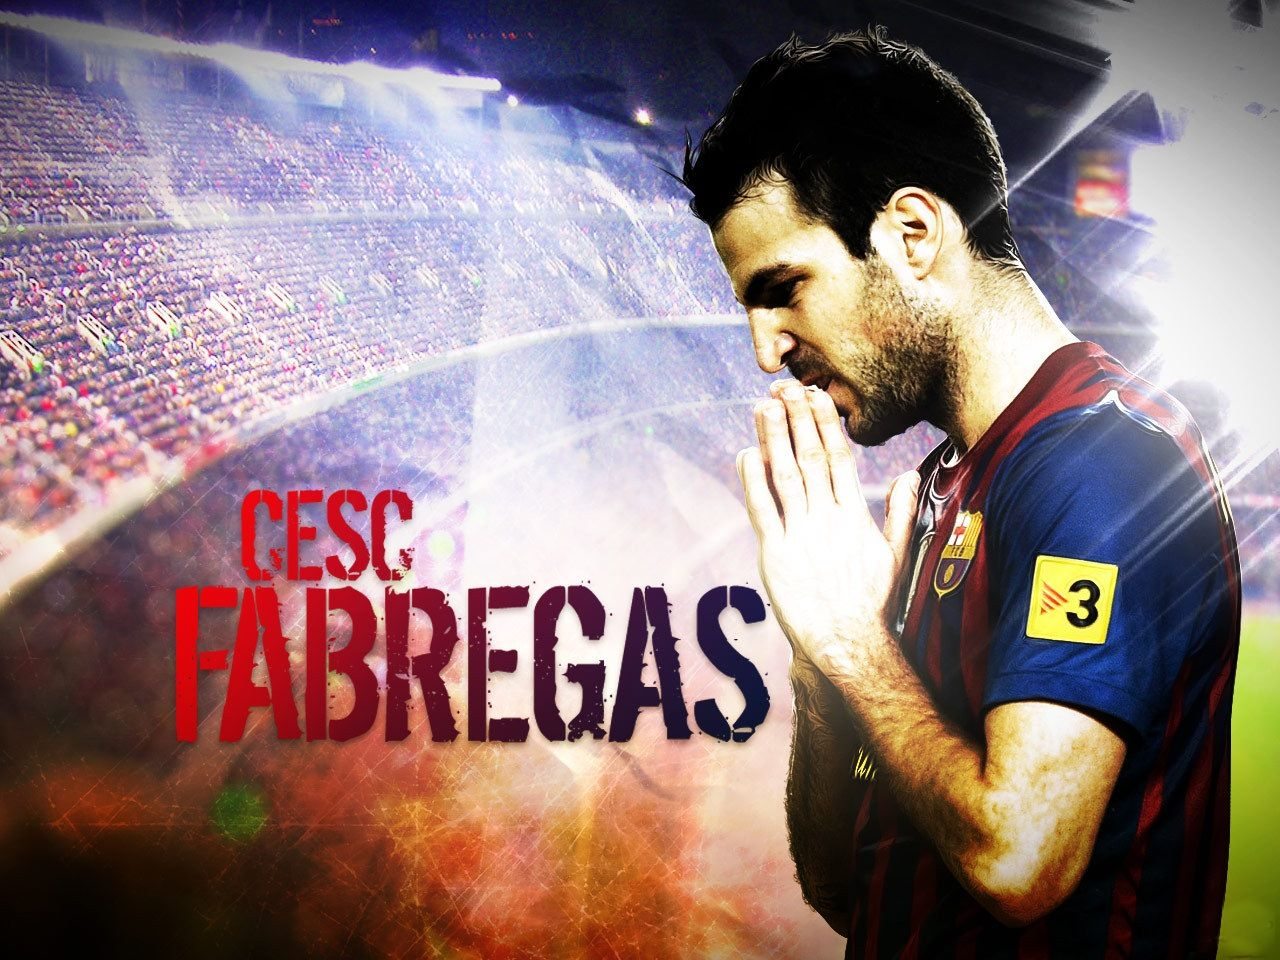 Cesc Fabregas Hd Wallpapers Cesc Fabregas Hd Wallpapers 1280x960